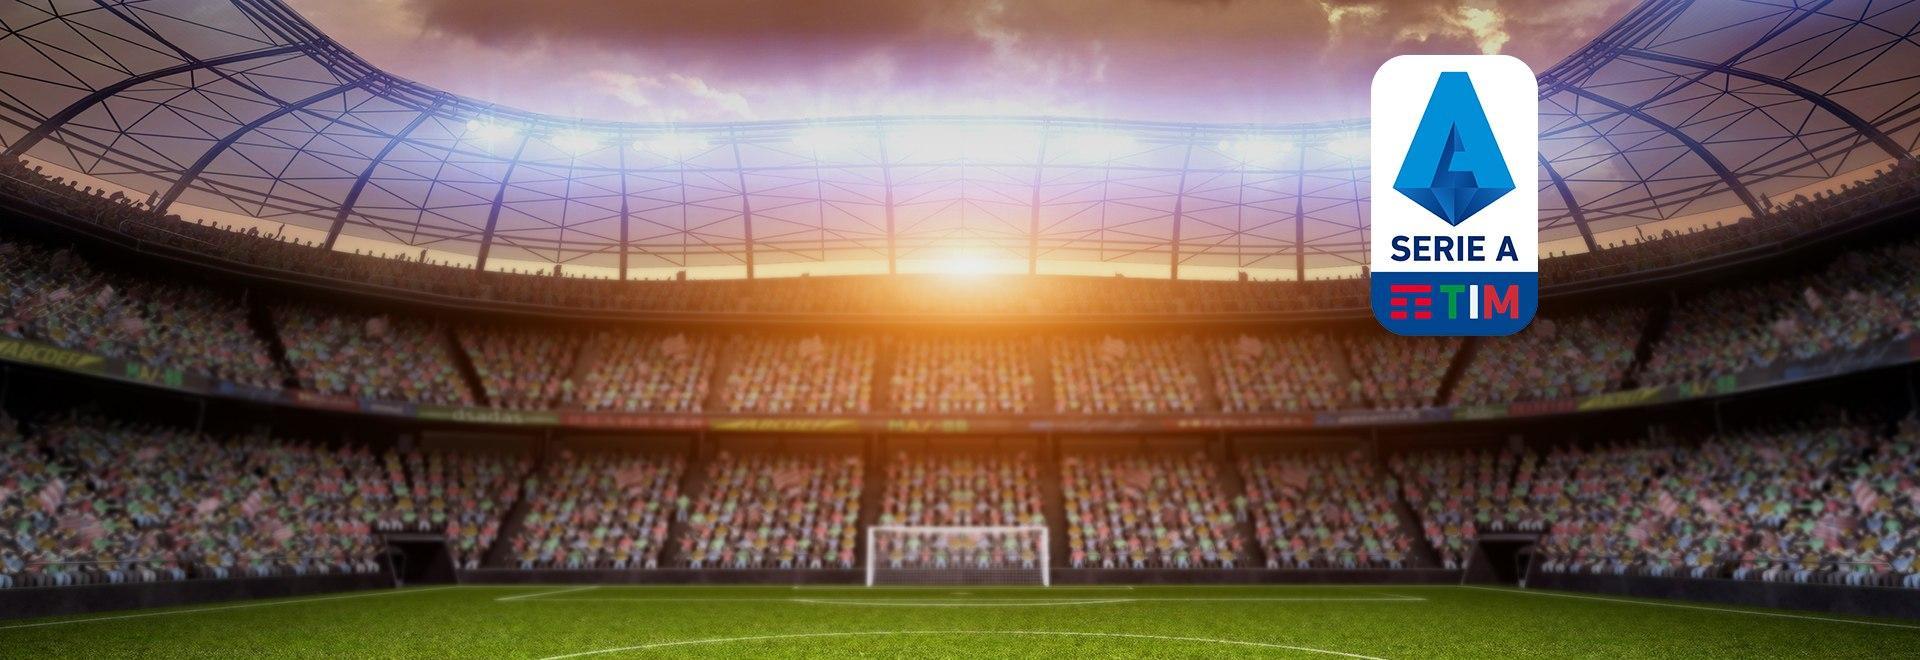 Serie A - Stag. 2019 Ep. 24a g. - Una partita